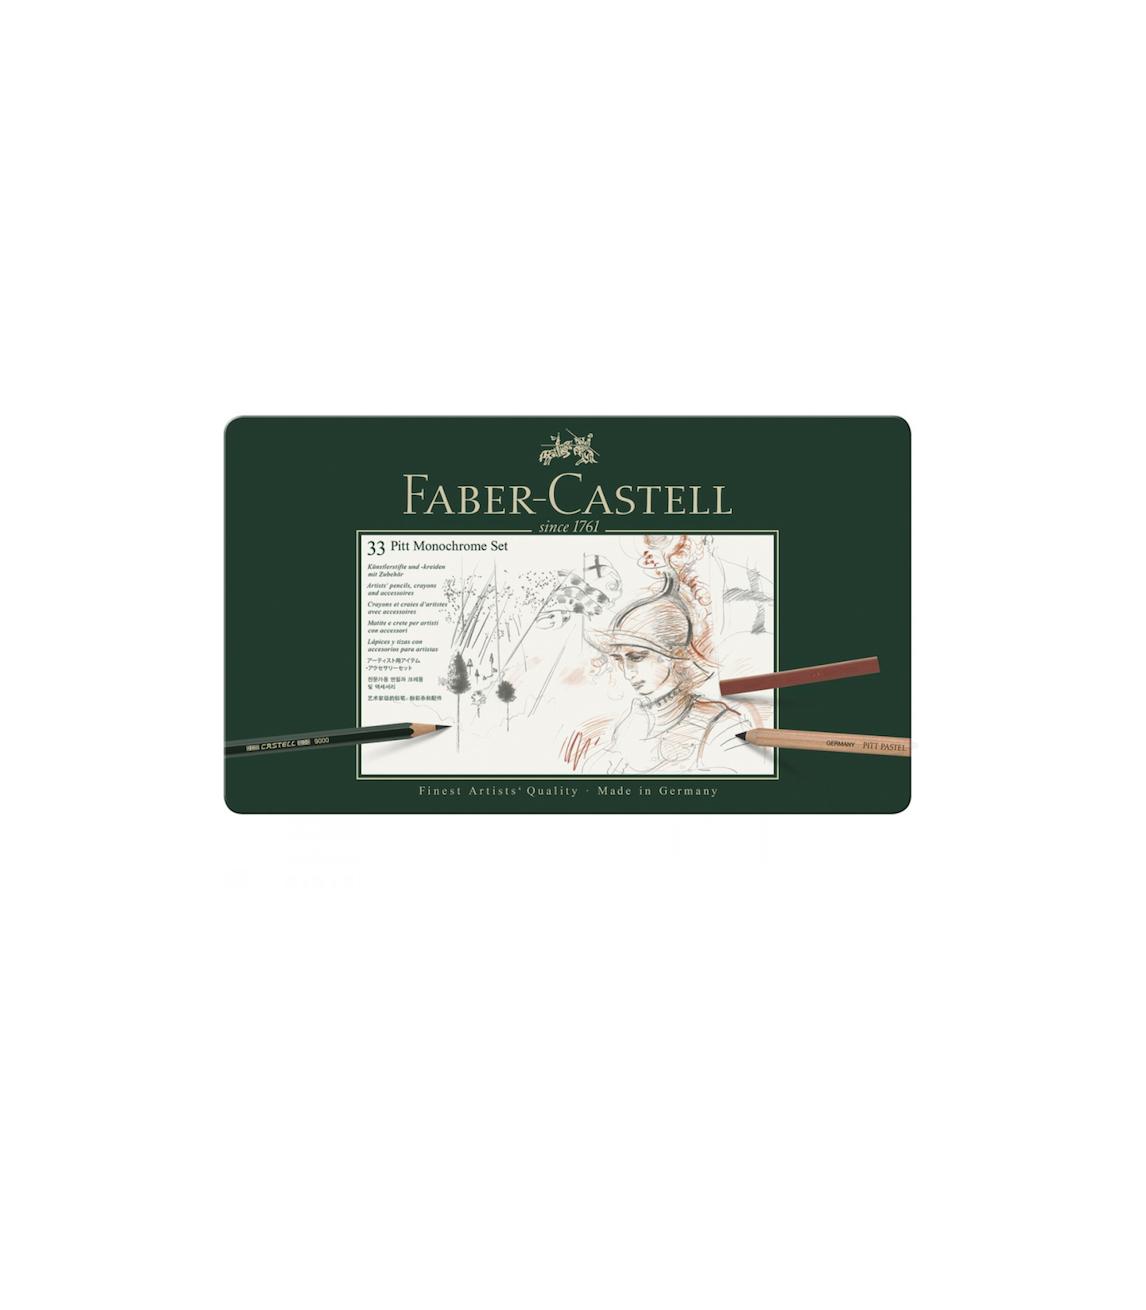 FABER CASTELL 33 PITT MONOCHROME SET PENCILS CRAYON COULEUR ART ARTISTE DESSIN DRAW 4005401129776 COMASOUND KARTEL CSK ONLINE